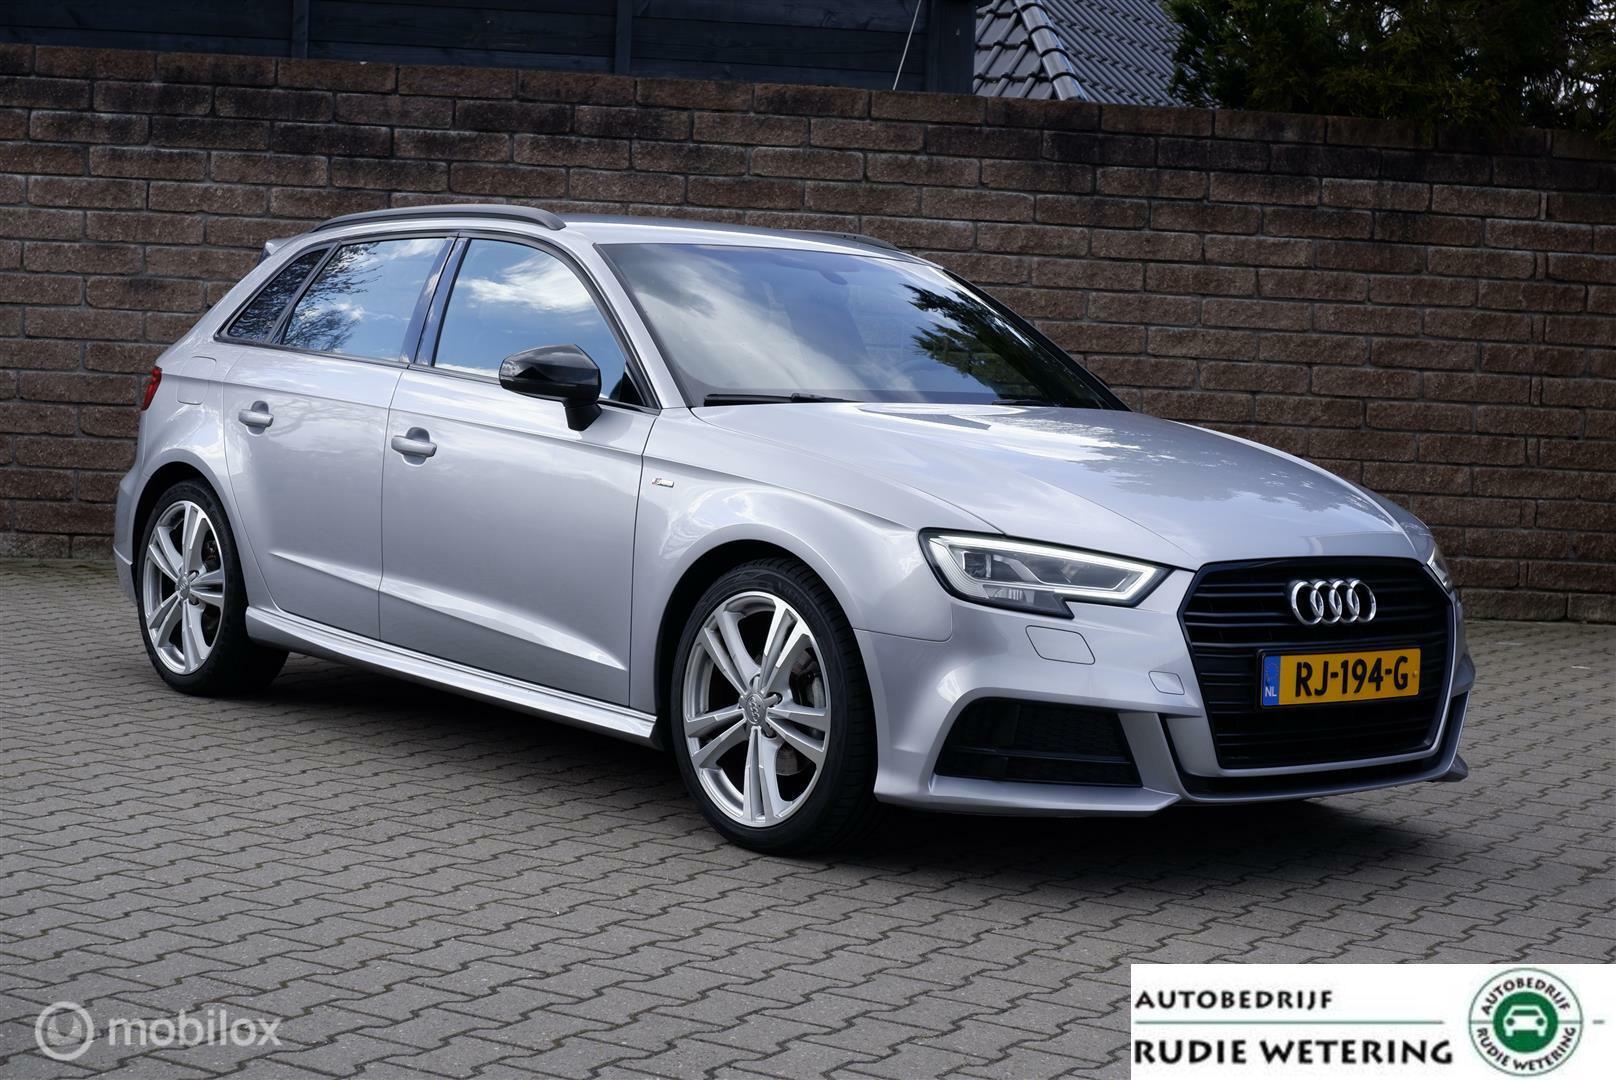 Audi A3 Sportback TFSI 116PK S-Tronic S-Line leer/led/nav/ecc/pdc/lmv18